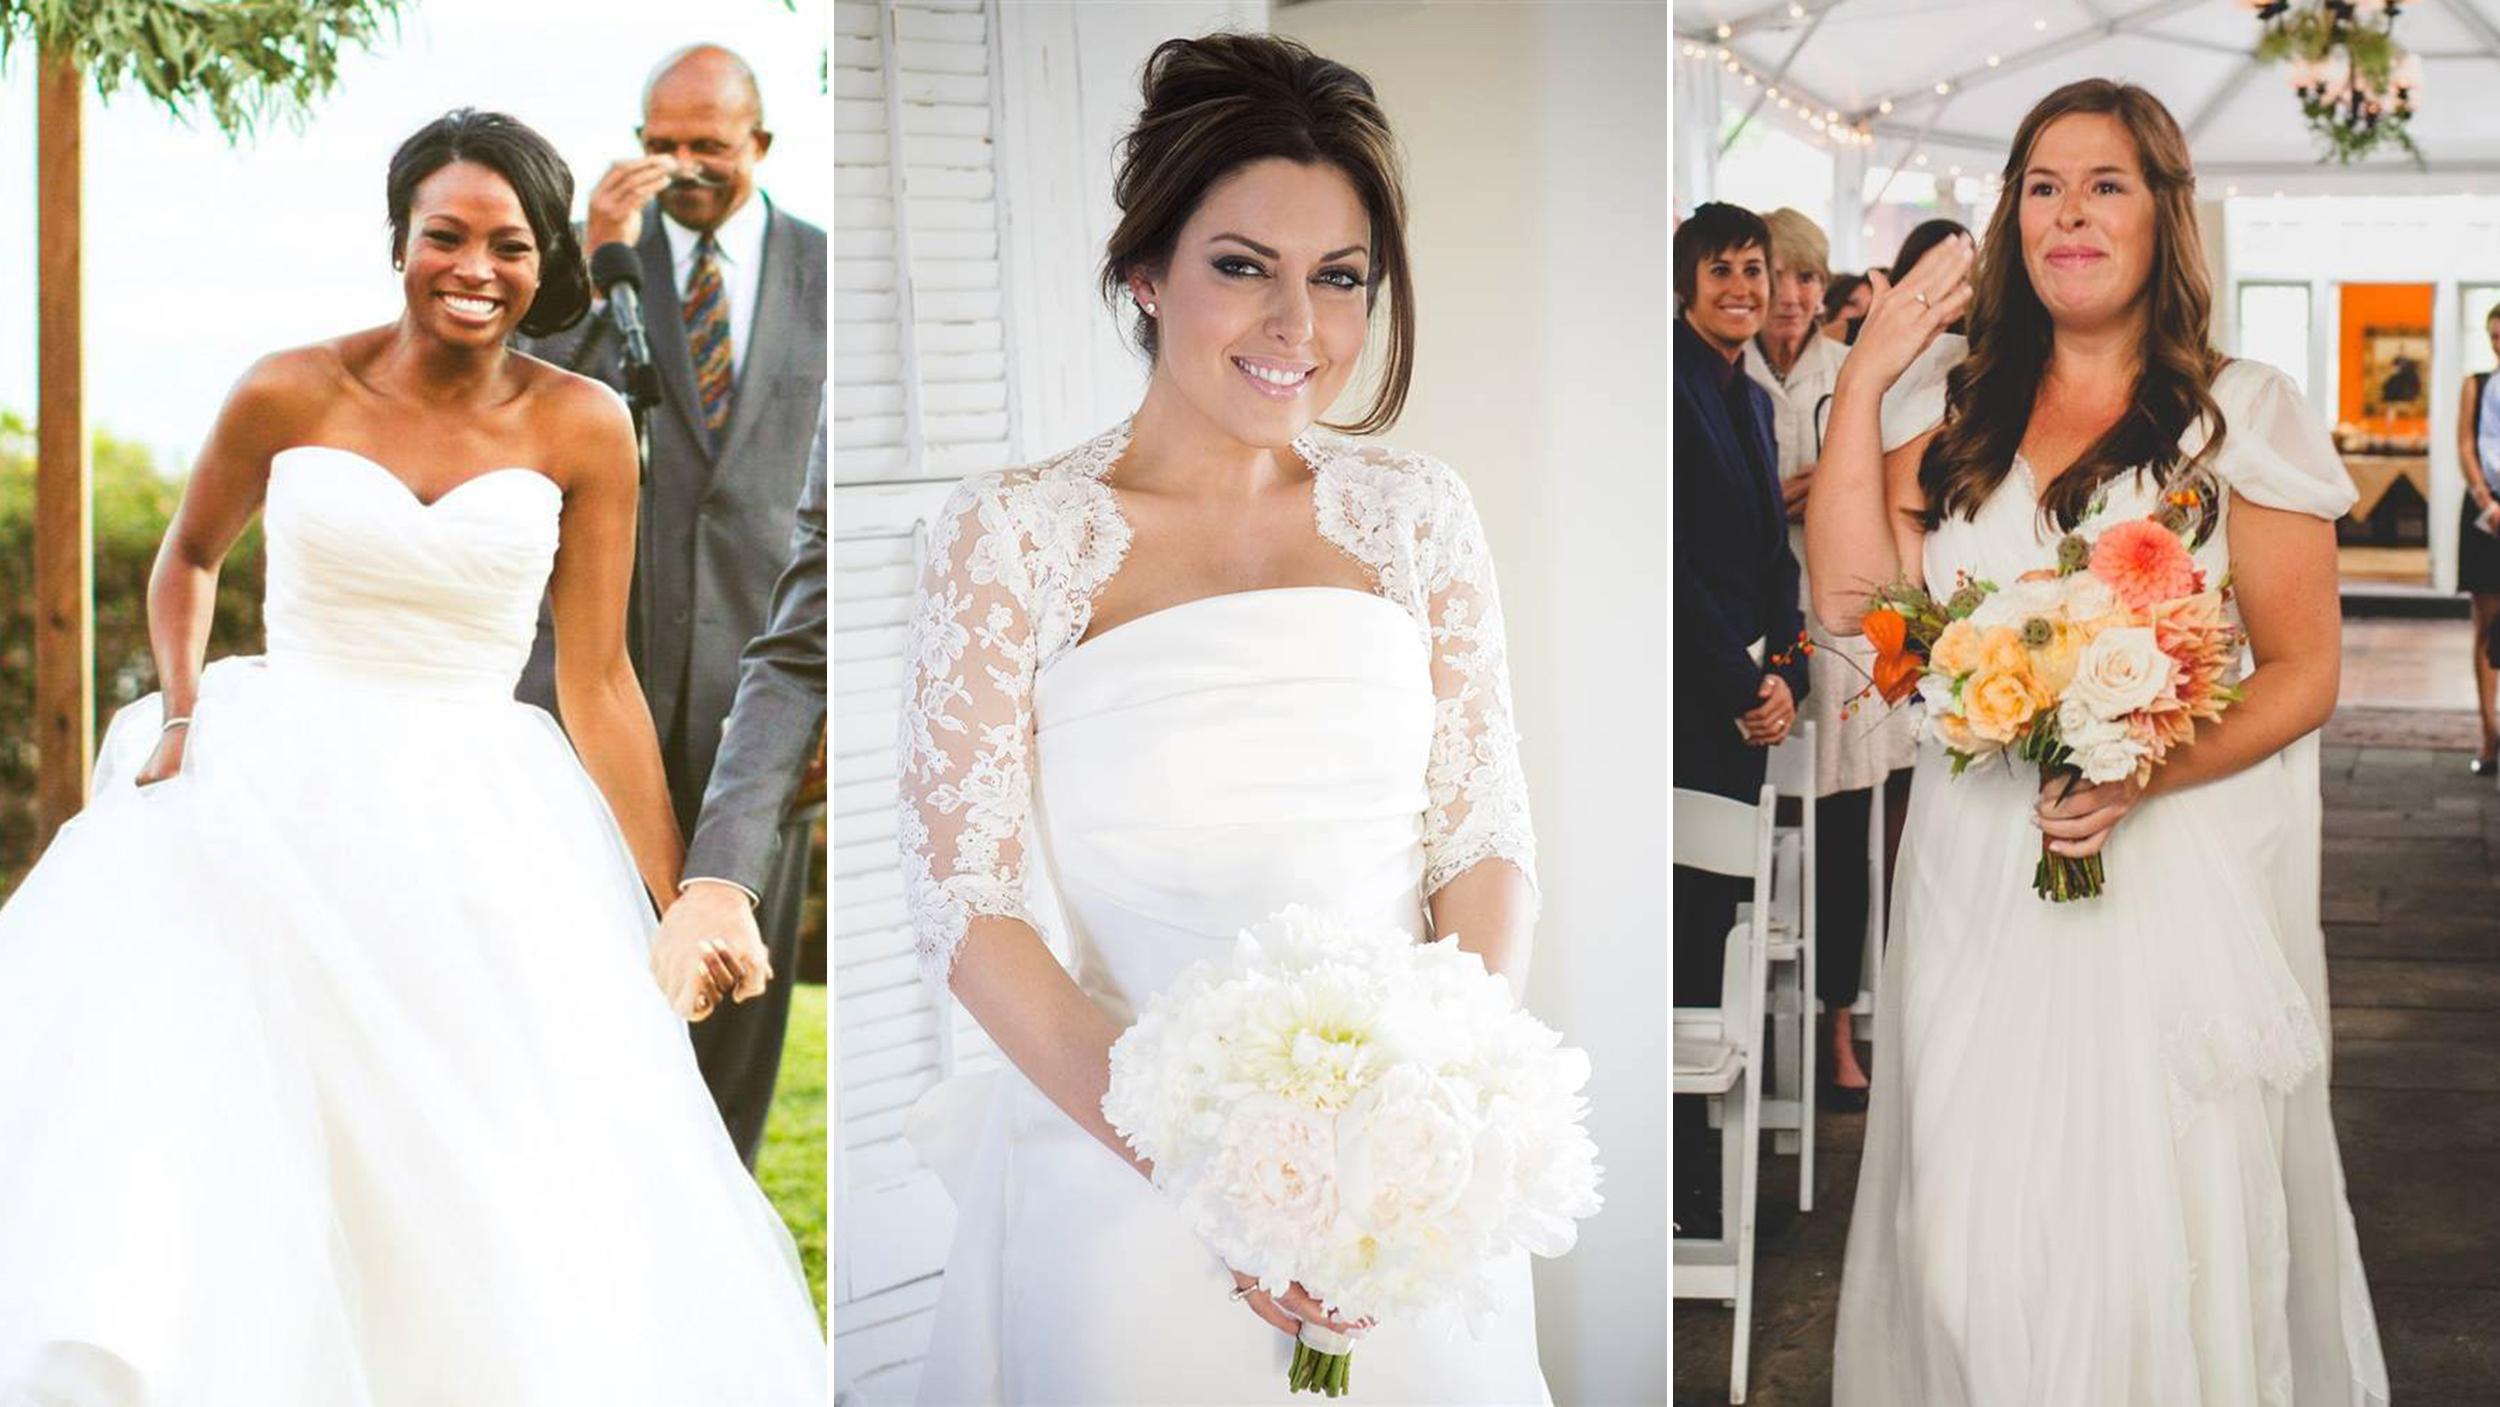 Bad wedding dresses images